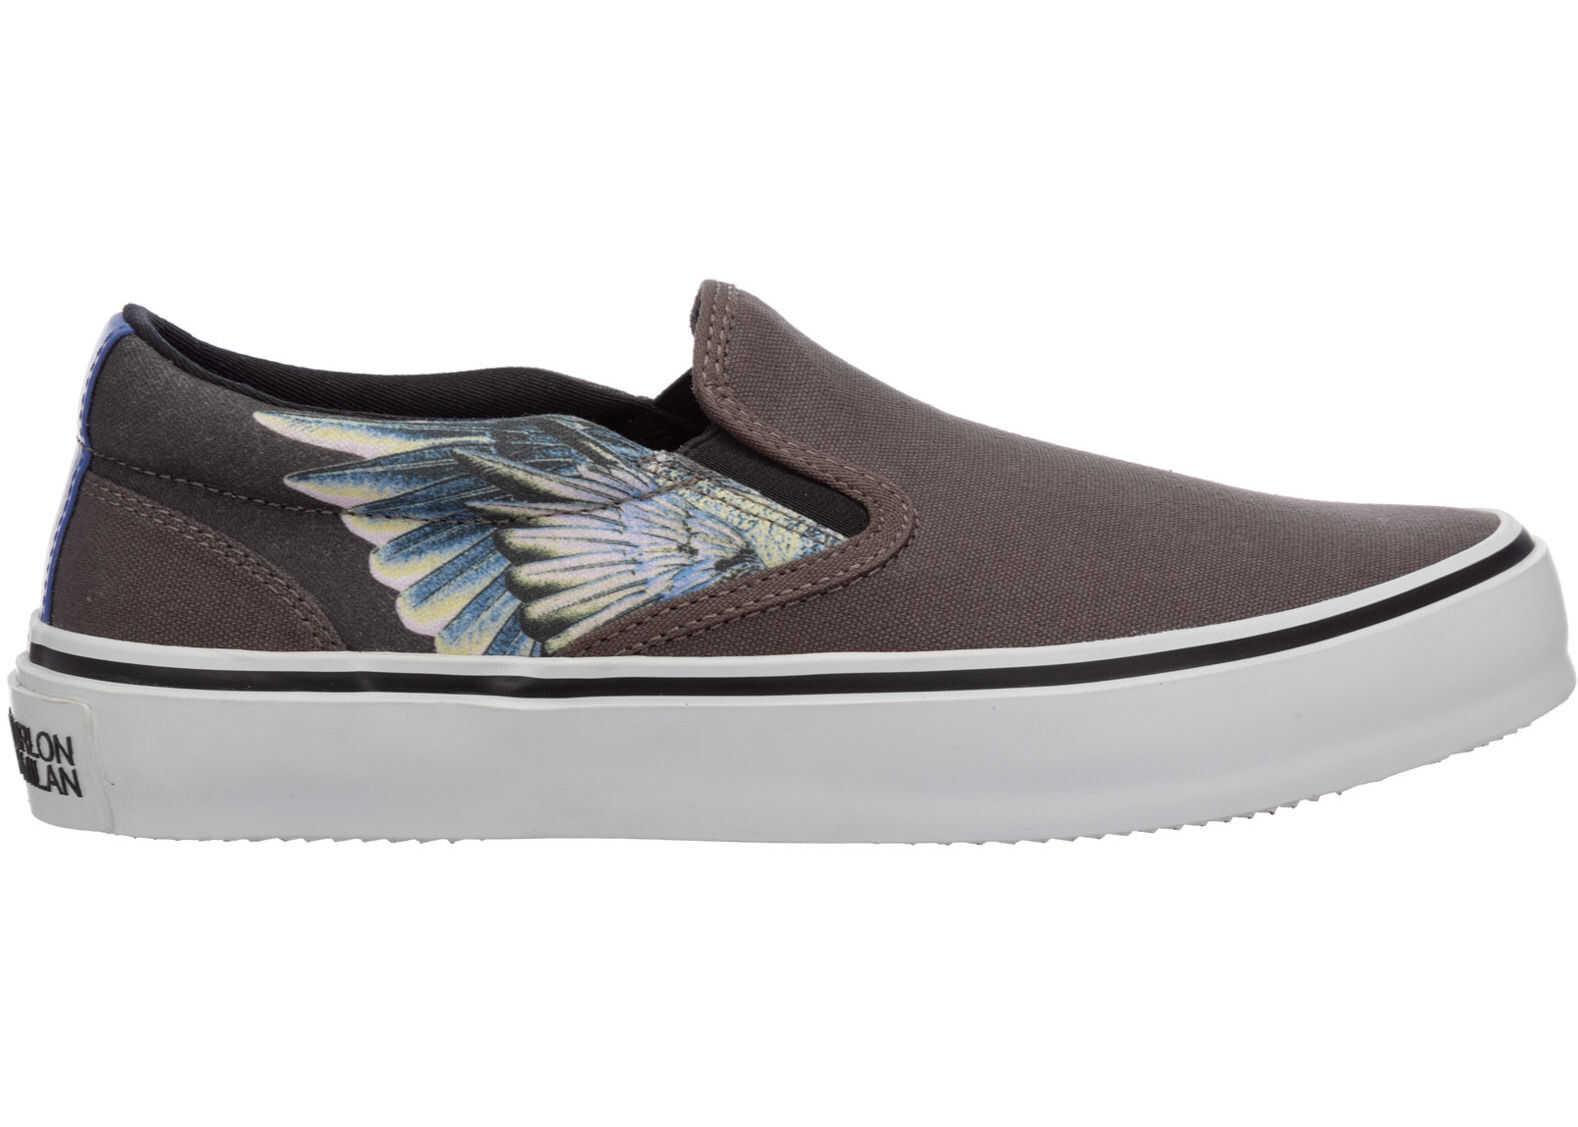 Marcelo Burlon Sneakers Wings CMIA079E20FAB0020730 Grey imagine b-mall.ro